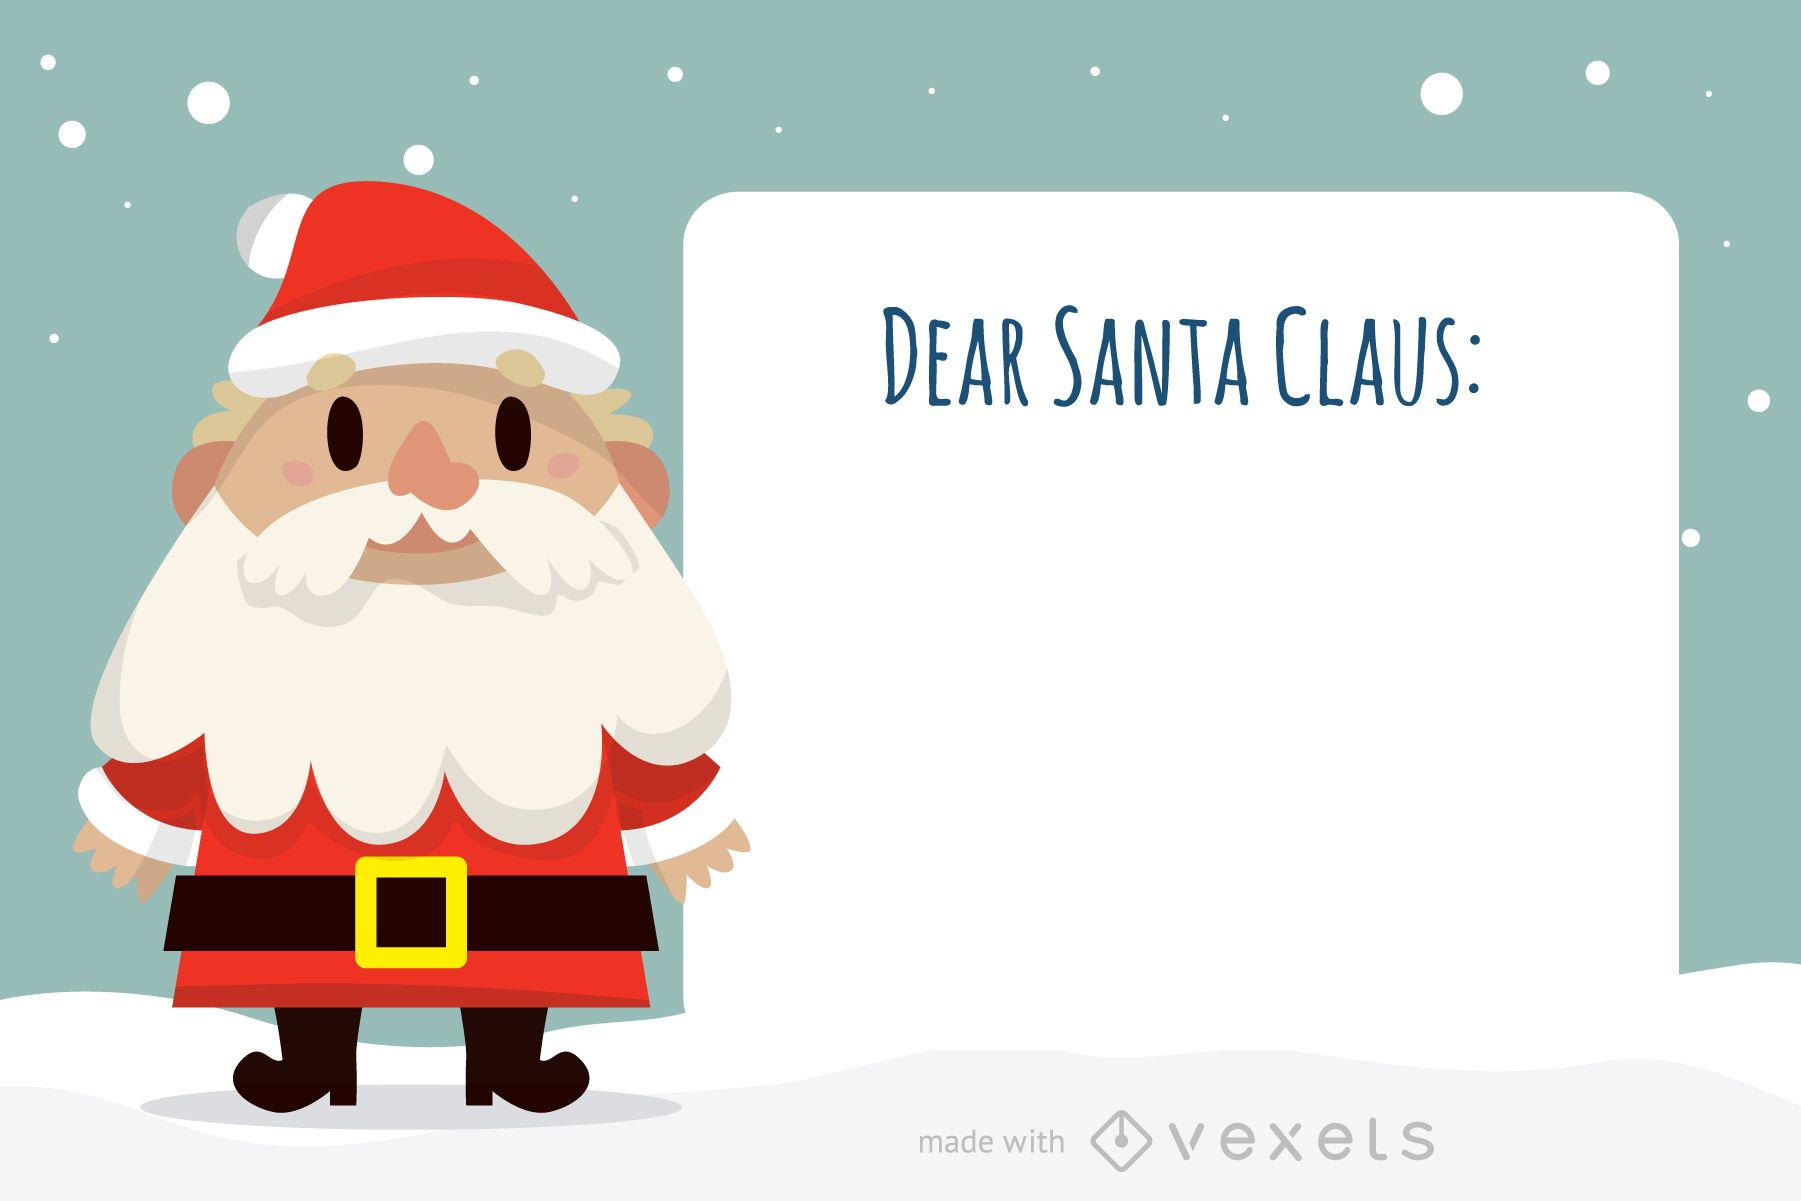 Dear santa claus letter maker editable design download large image 1801x1201px kristyandbryce Choice Image